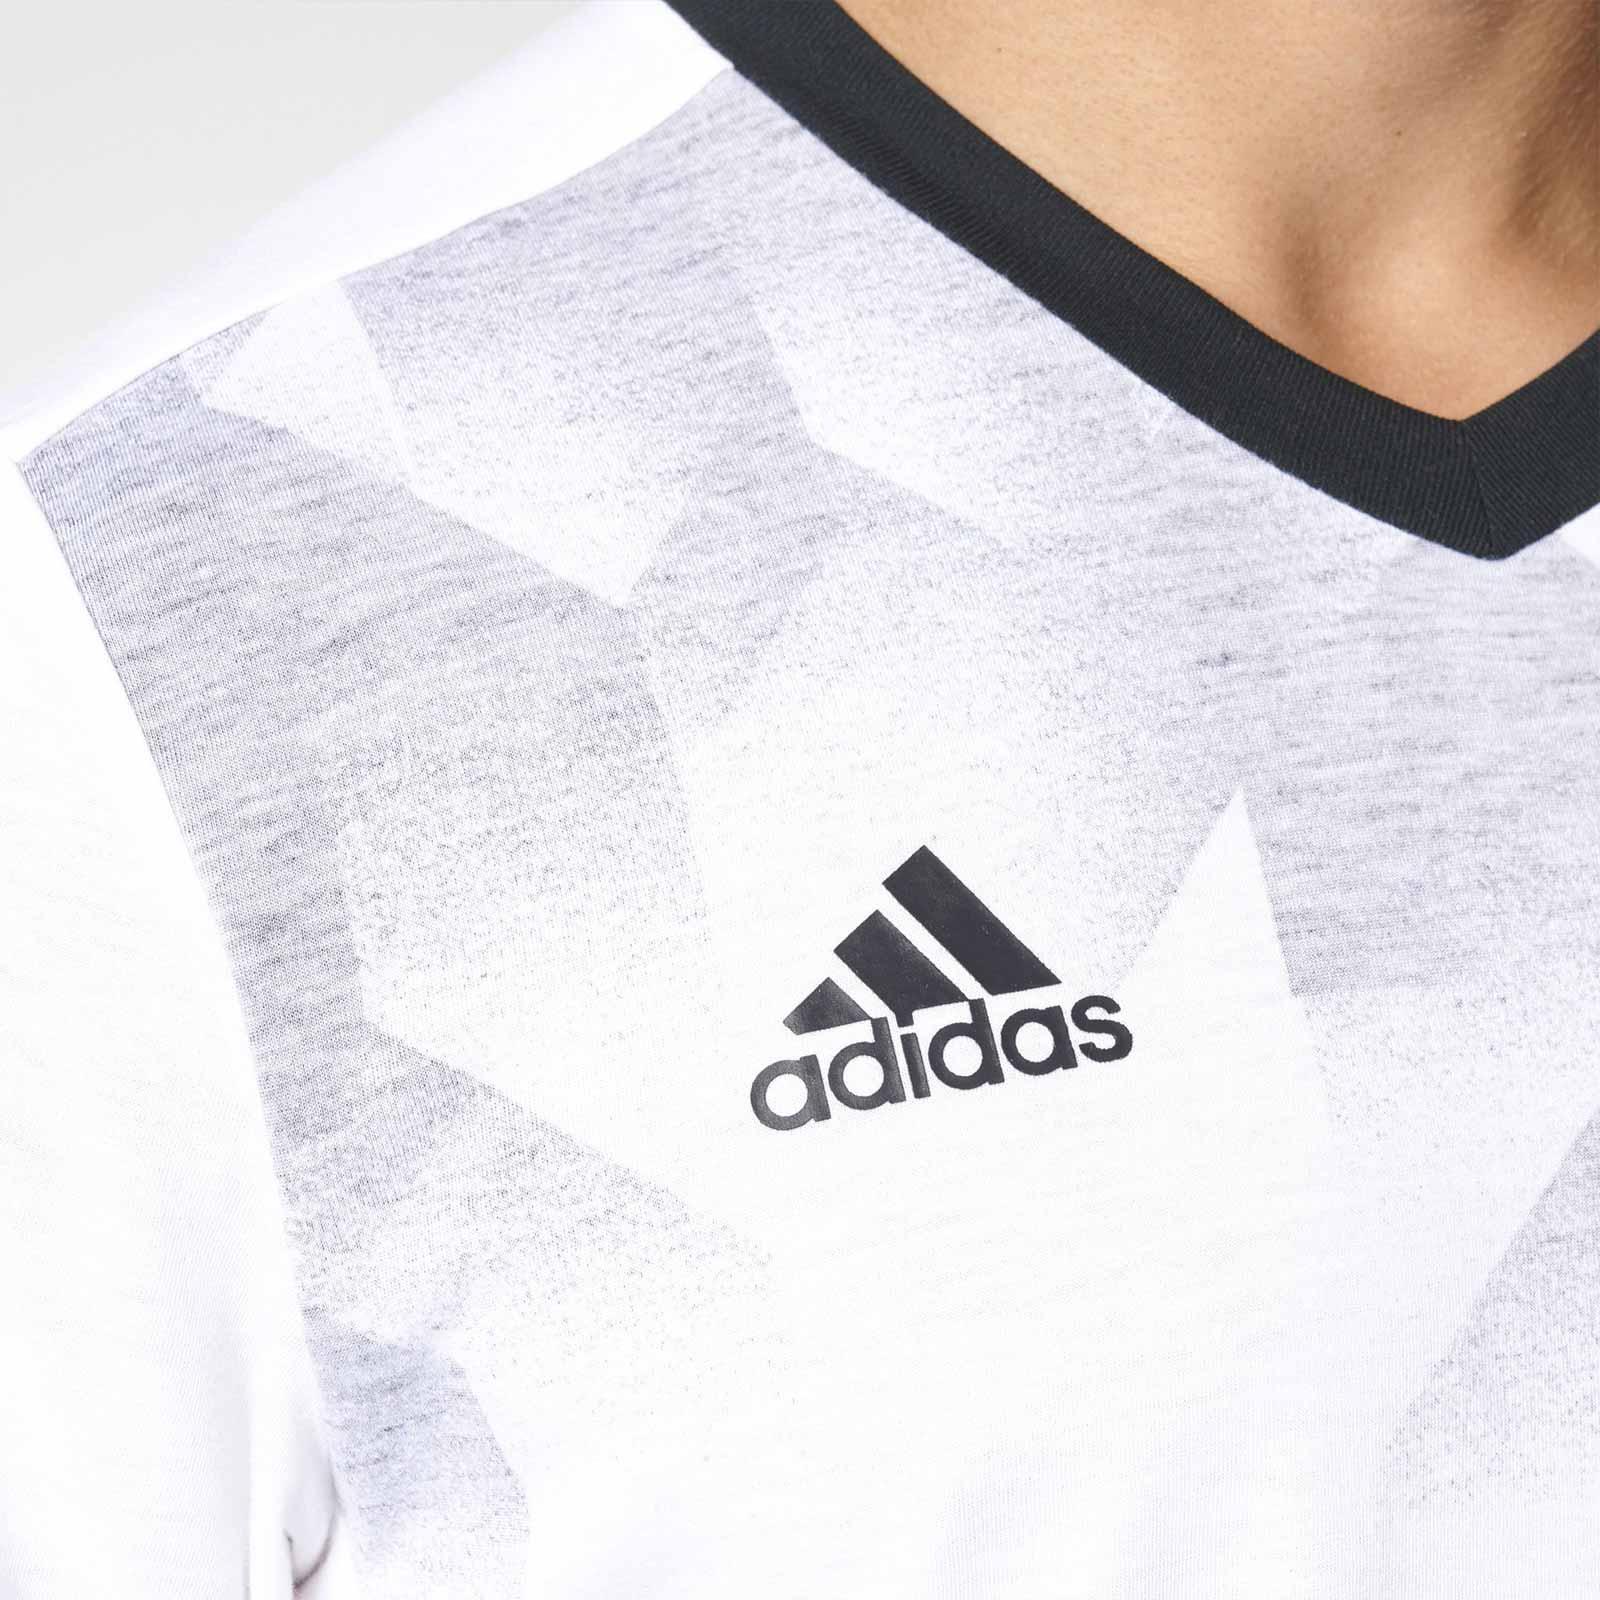 germany-2017-confed-cup-pre-match-shirt-logo